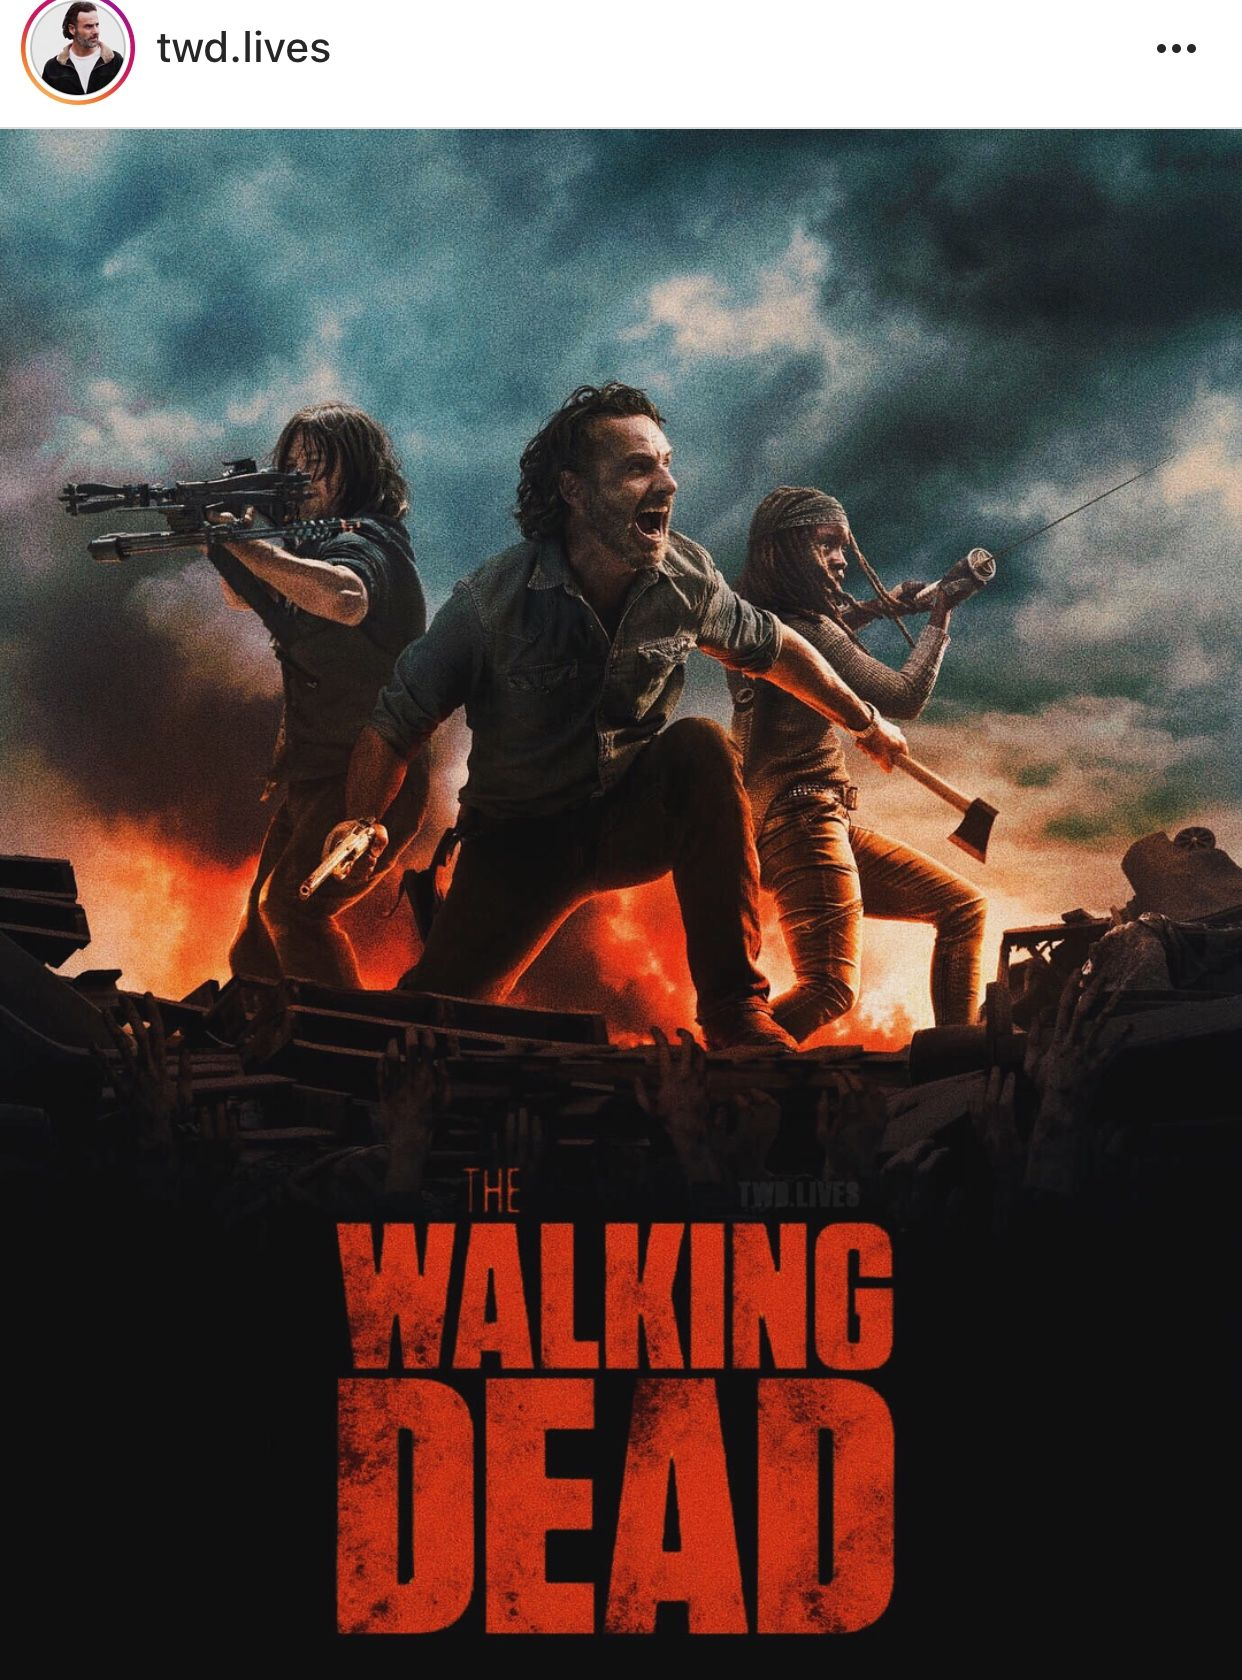 Pin de Israel Hidalgo en IMG The walking dead personajes